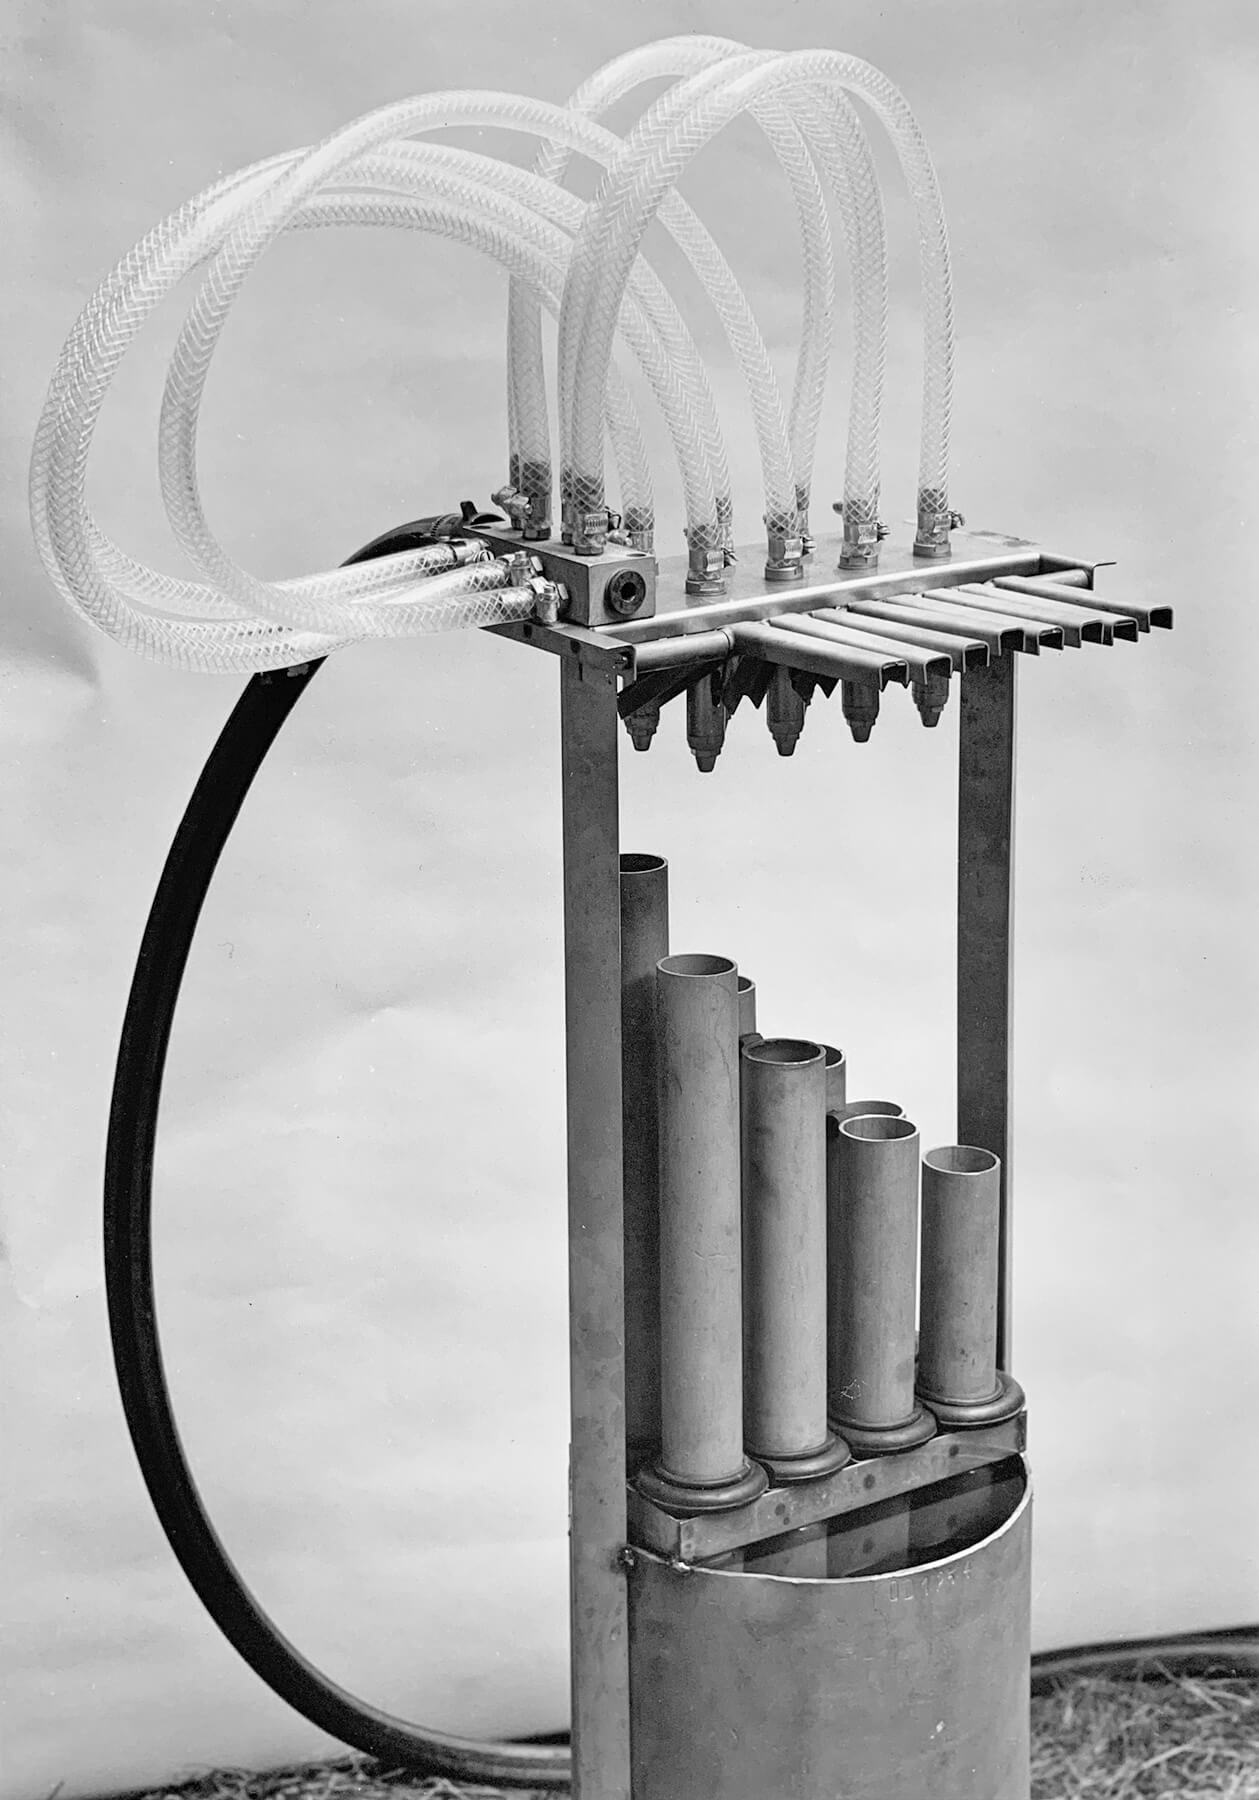 Bildhauer OMI Riesterer Karlsruhe Projekte Wasserorgel